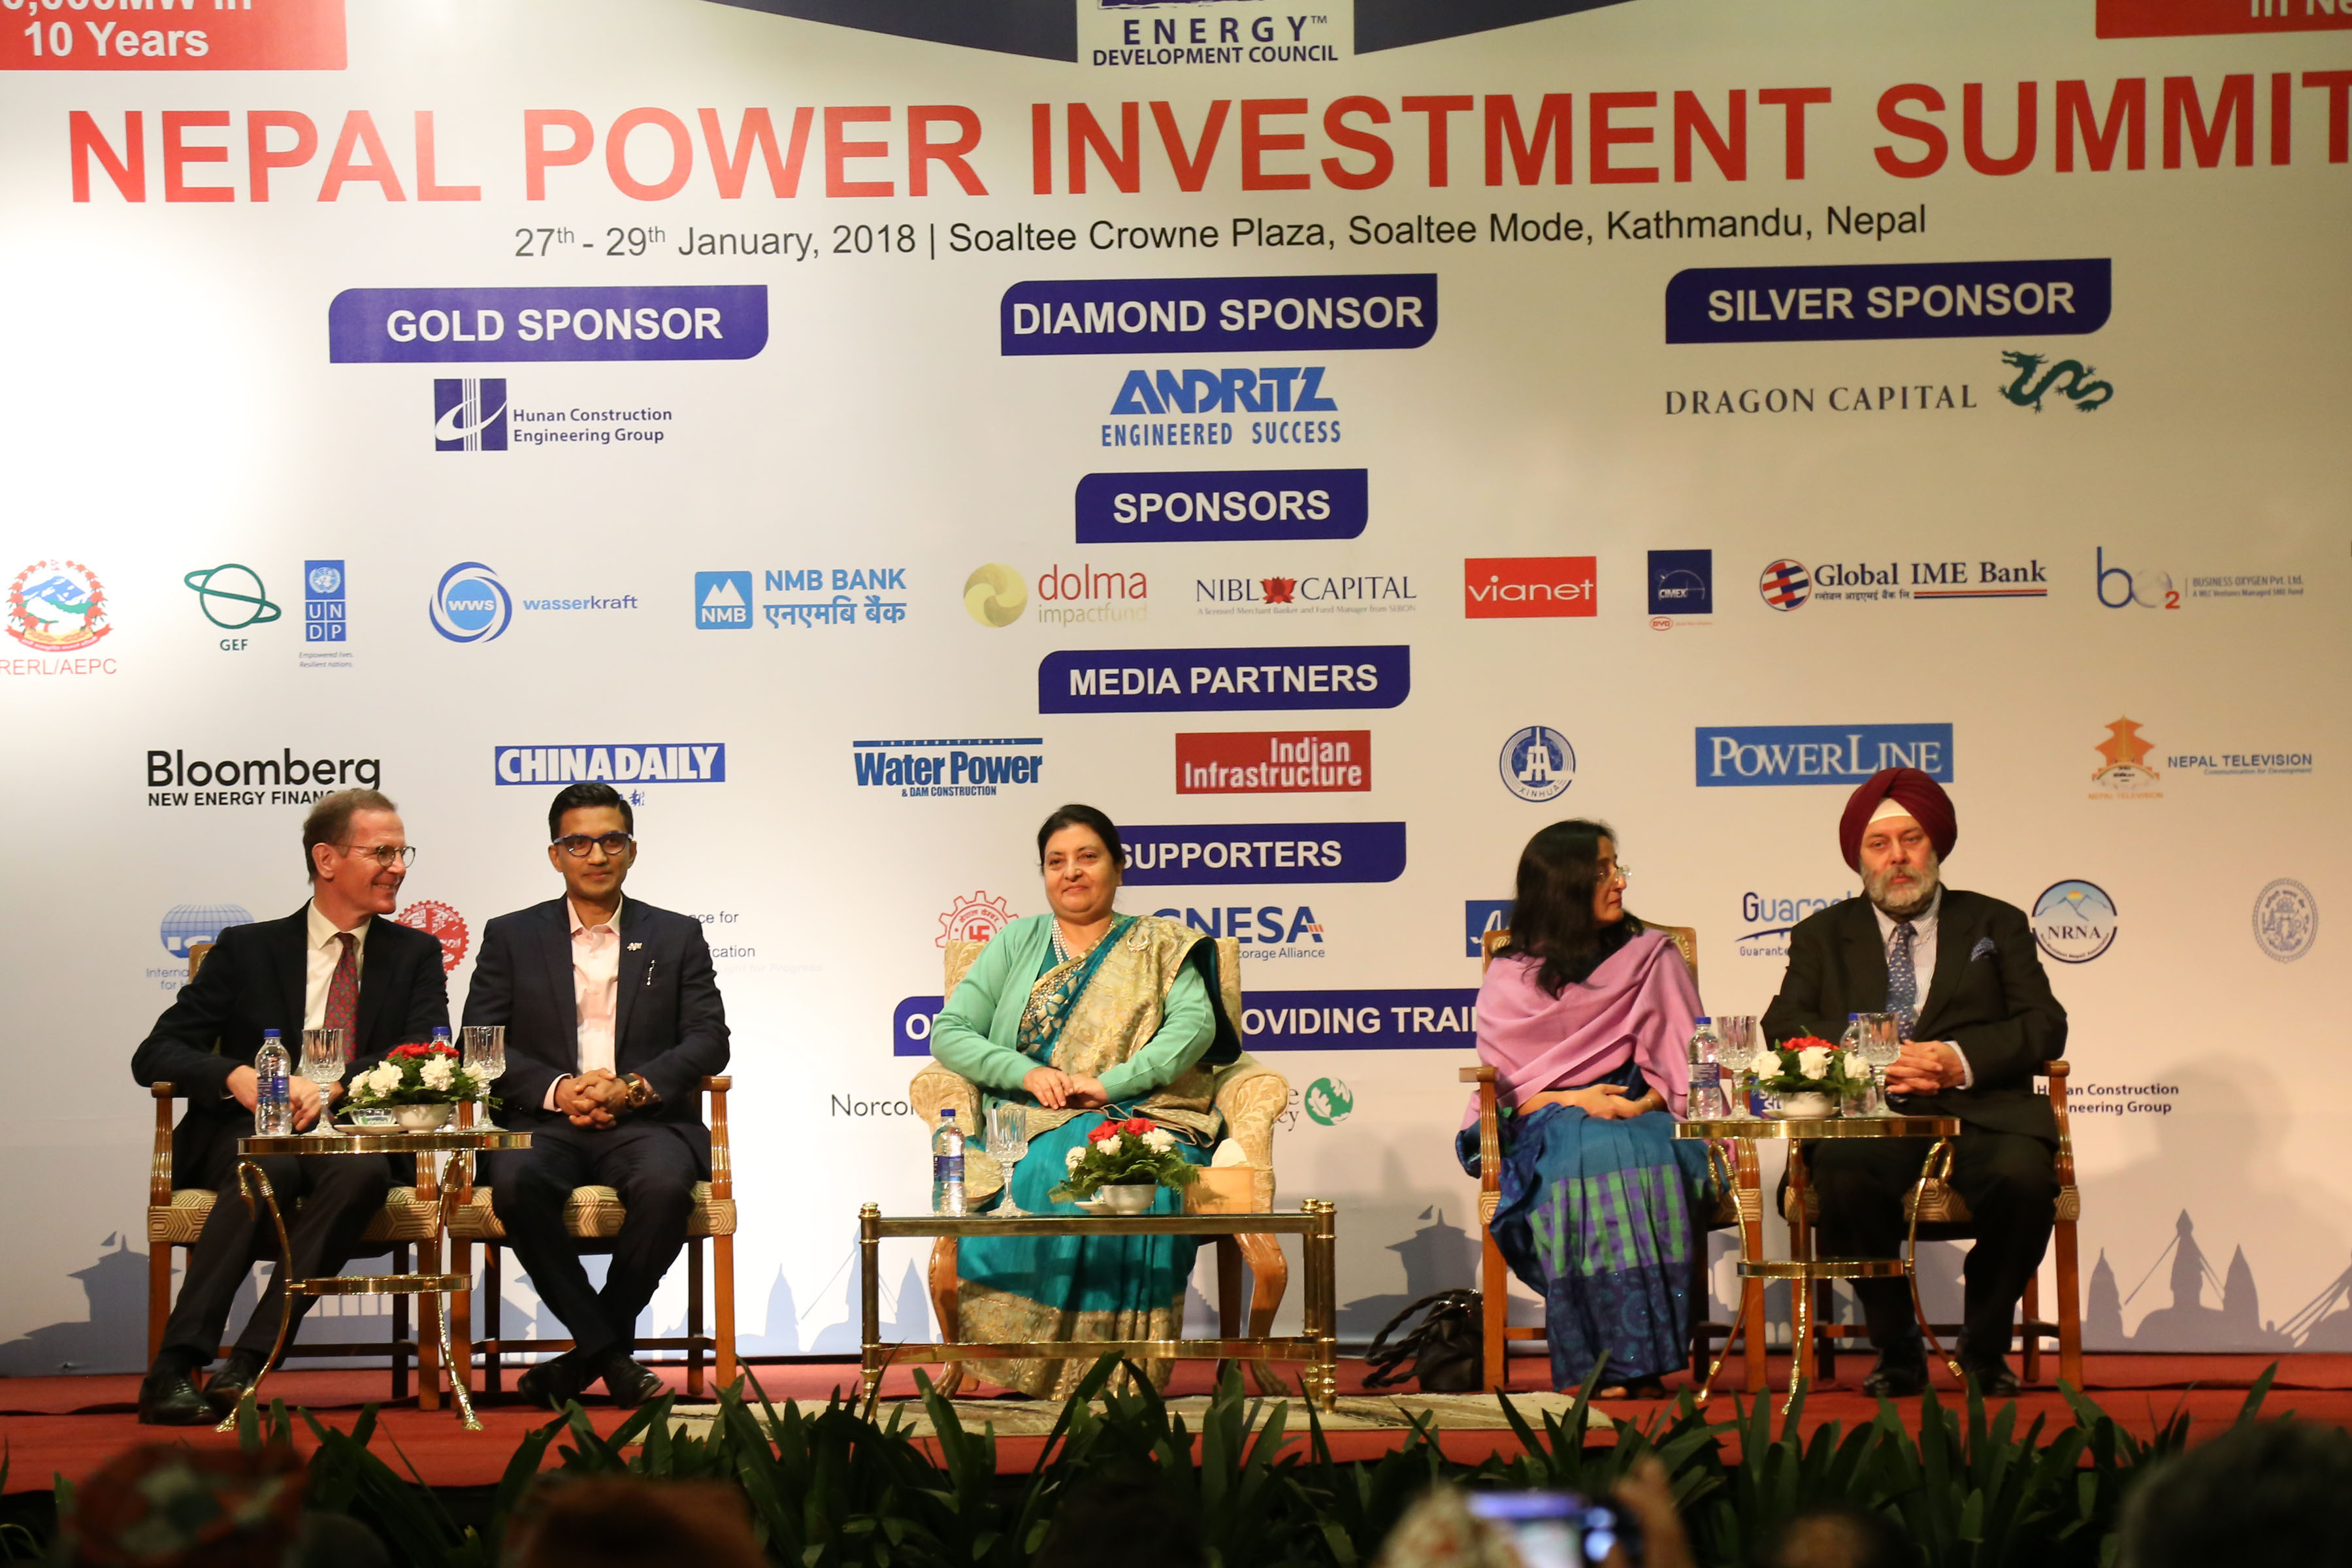 President Bhandari said this while inaugurating Nepal Power Investment Summit organized by Energy Development Council in Kathmandu